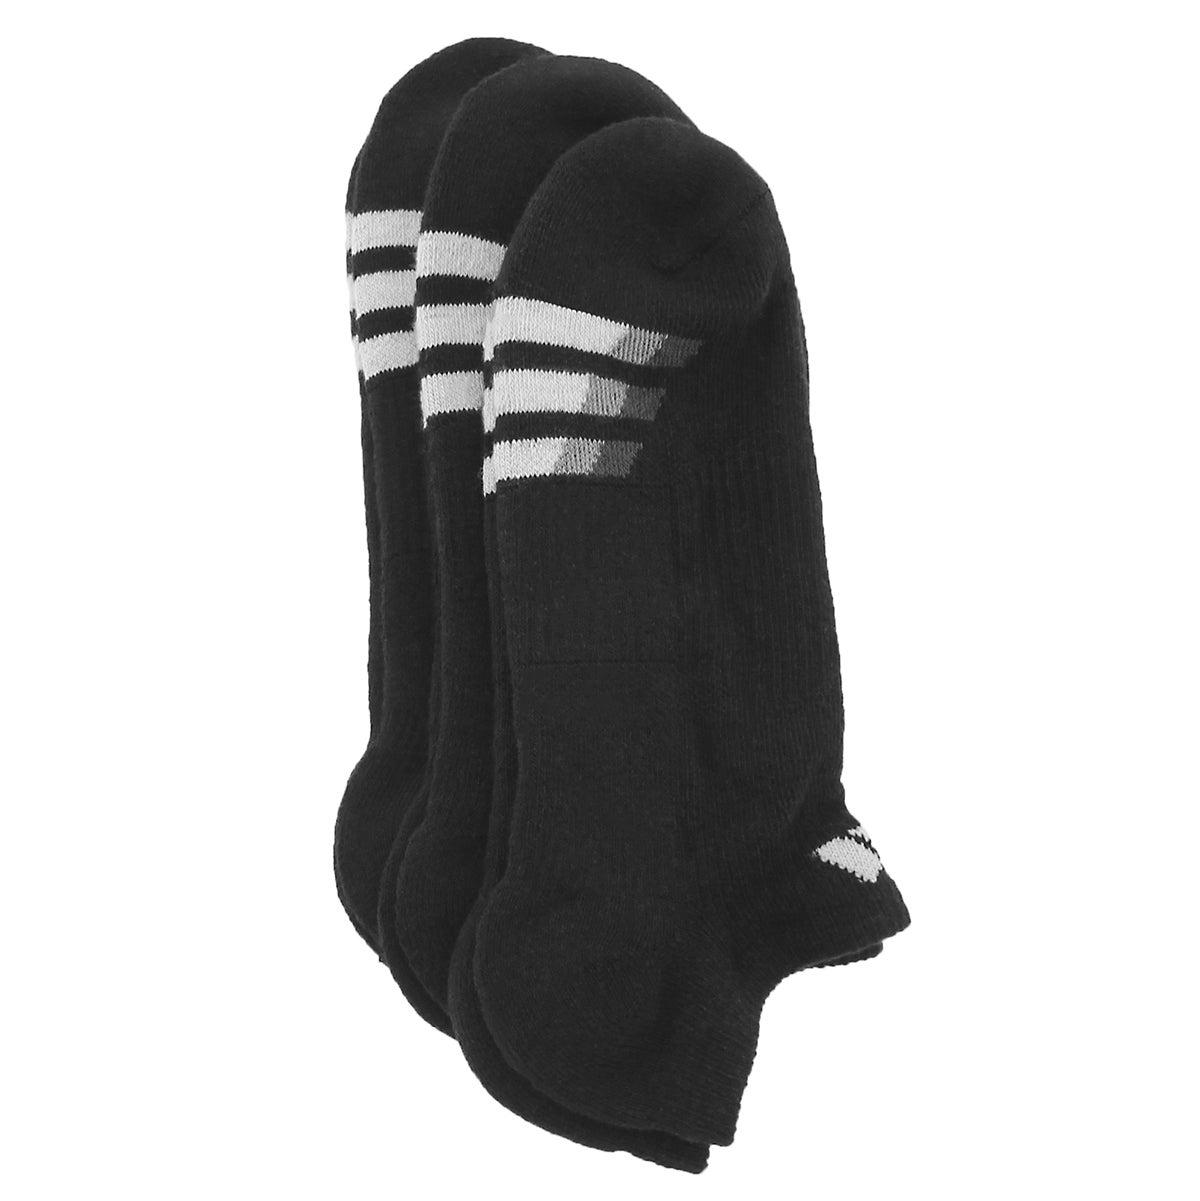 Men's CUSHIONED NO SHOW black socks - 3pk